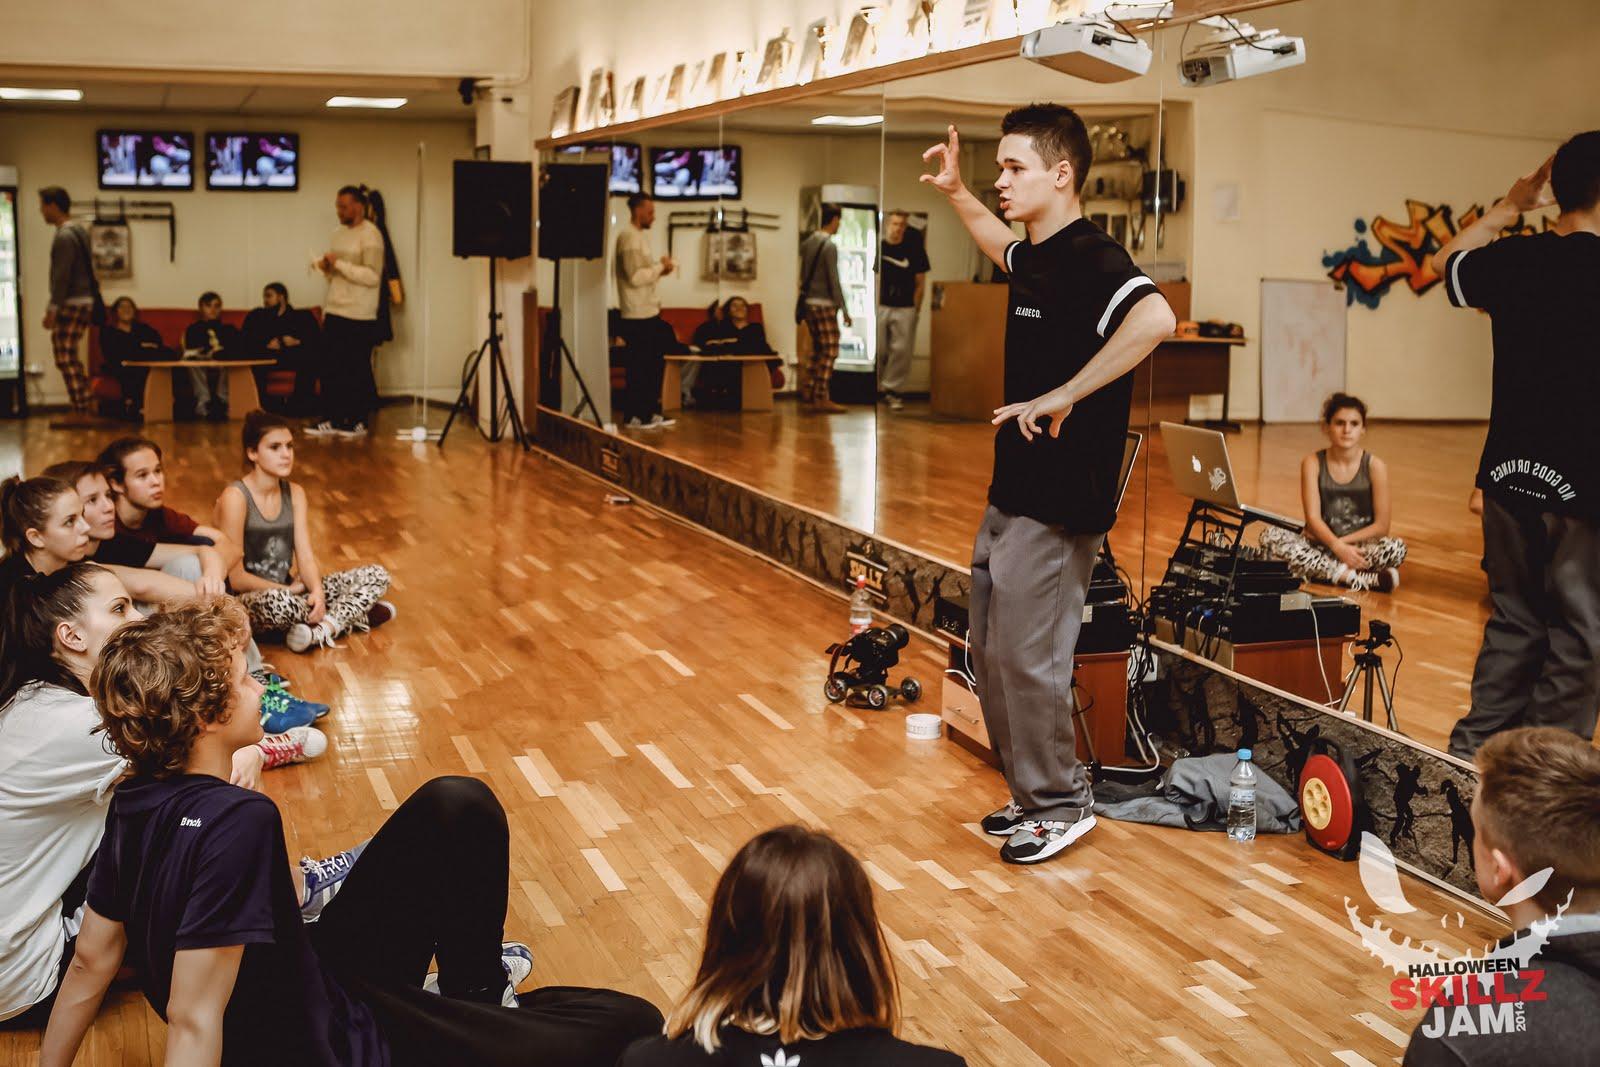 Šokių seminarai su Bouboo, Kaczorex, Tanya, Marek - _MG_7436.jpg